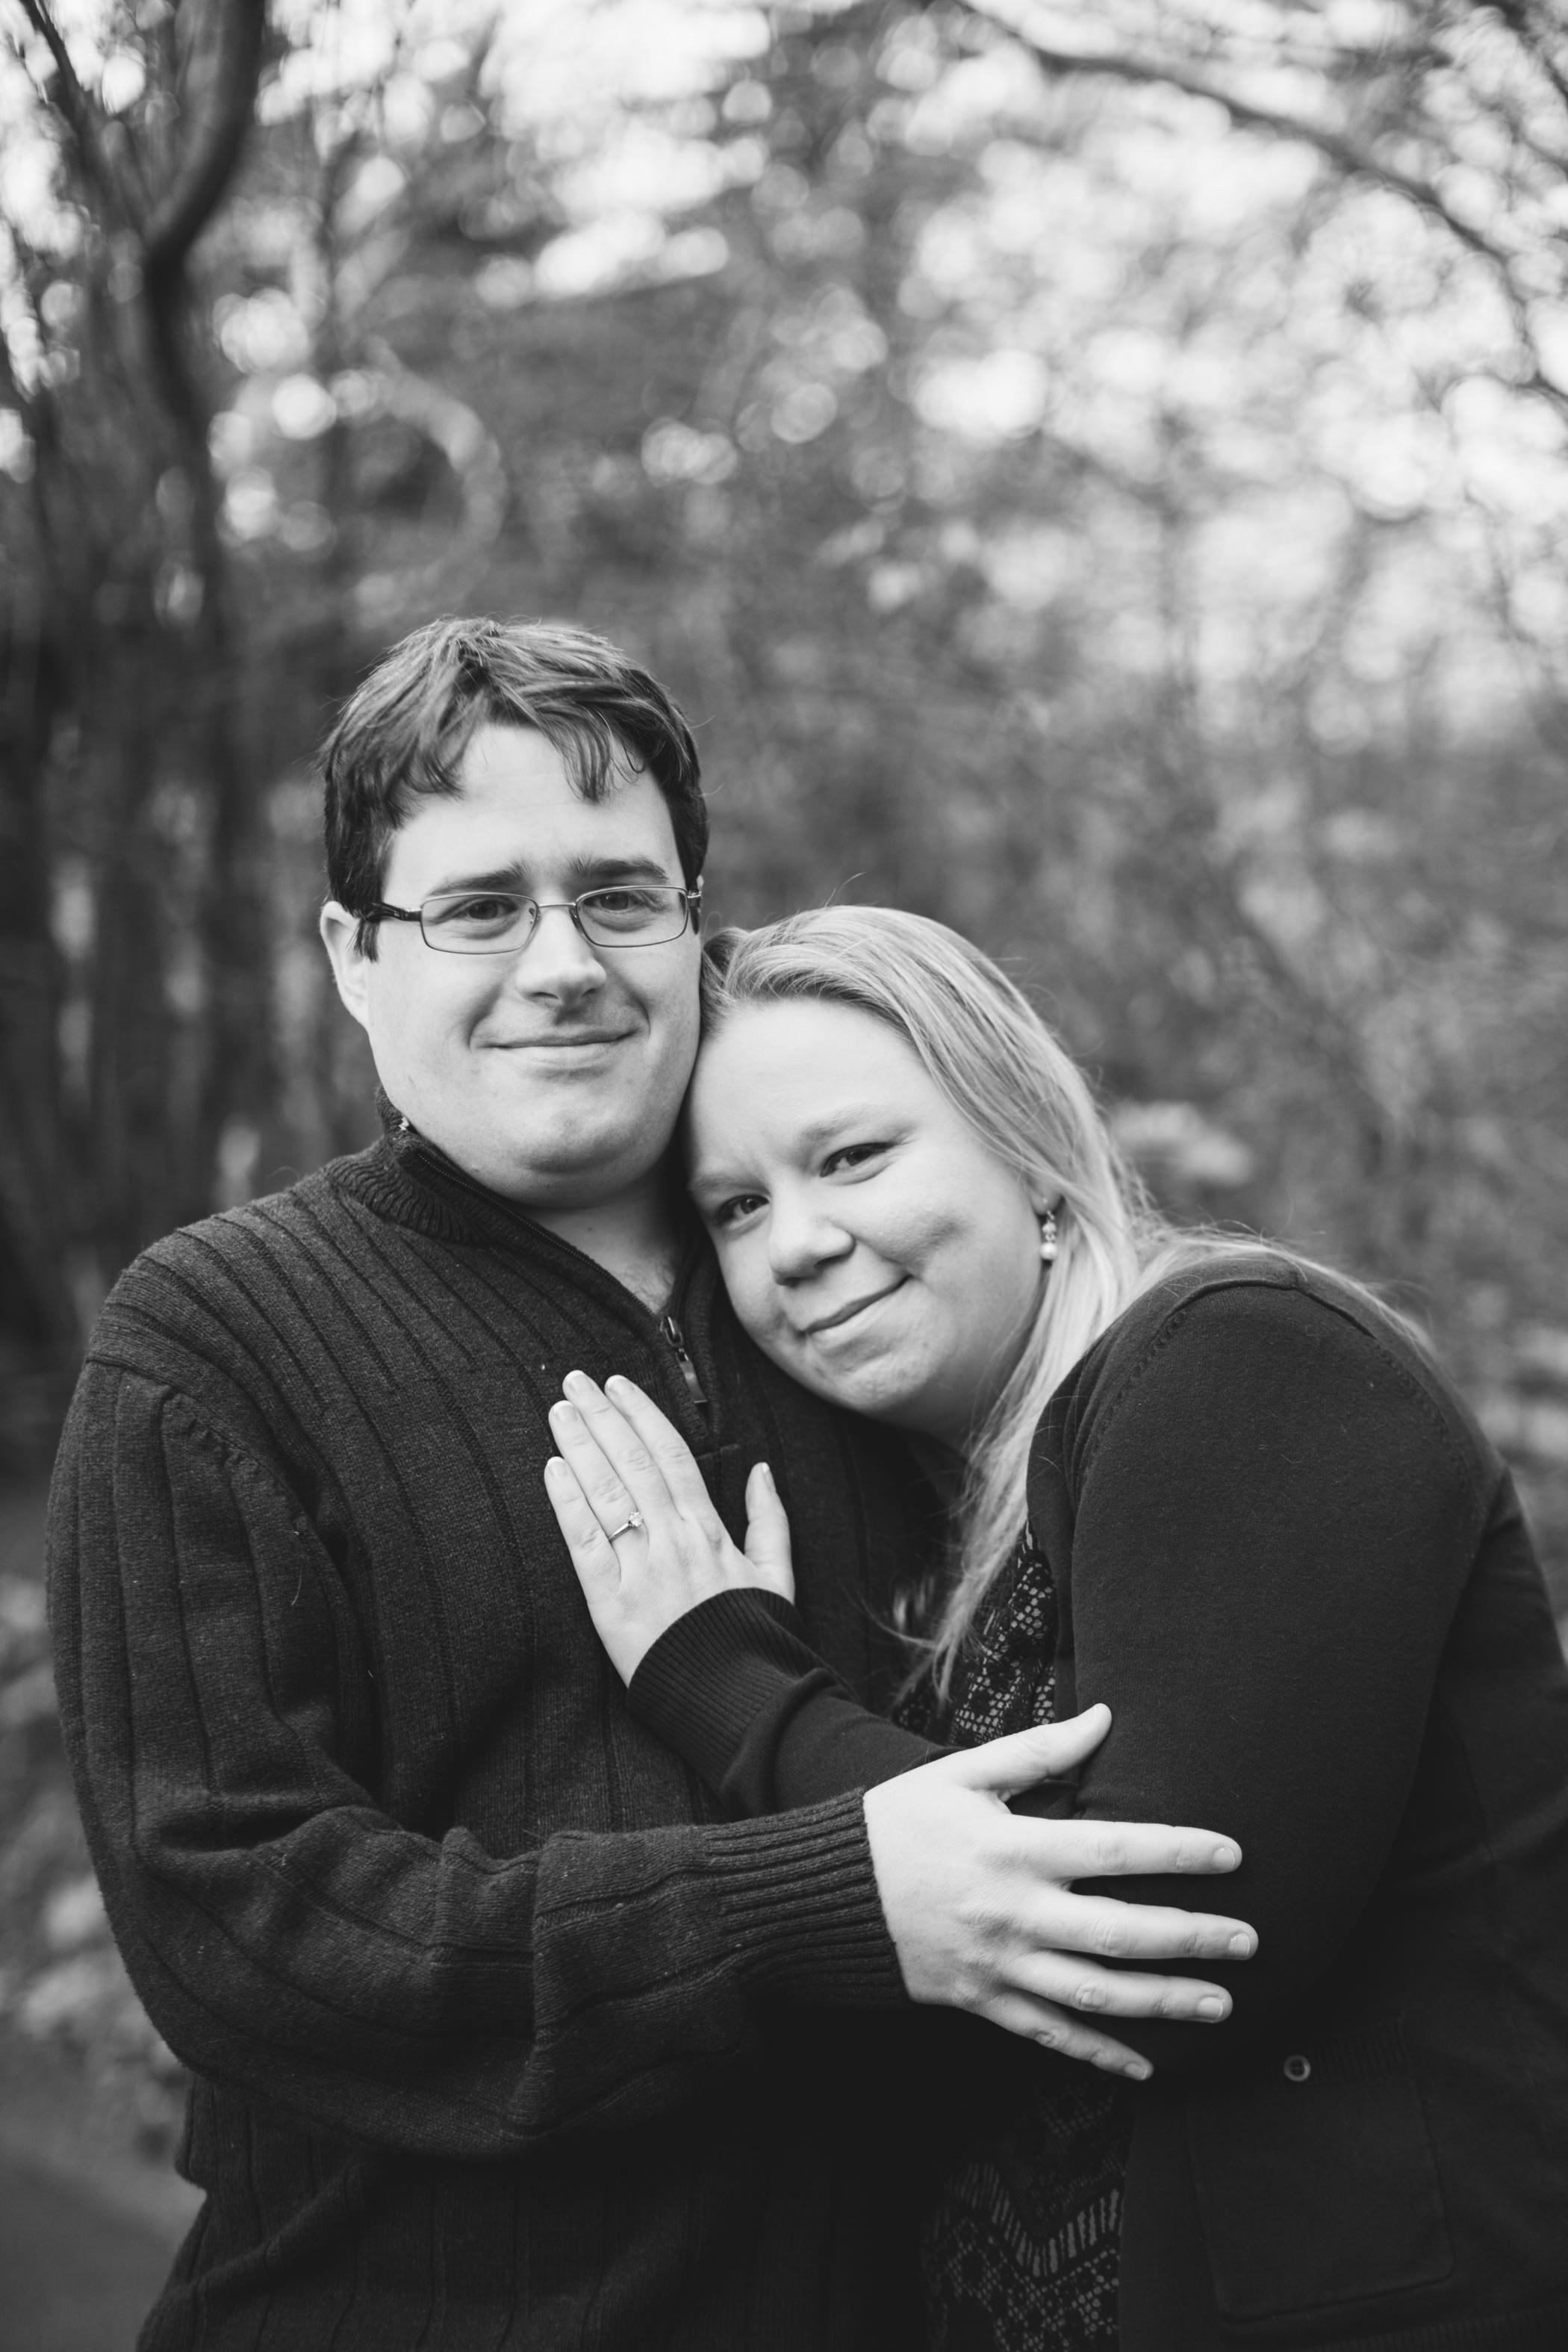 Mary & Bill engagement photos-4.jpg